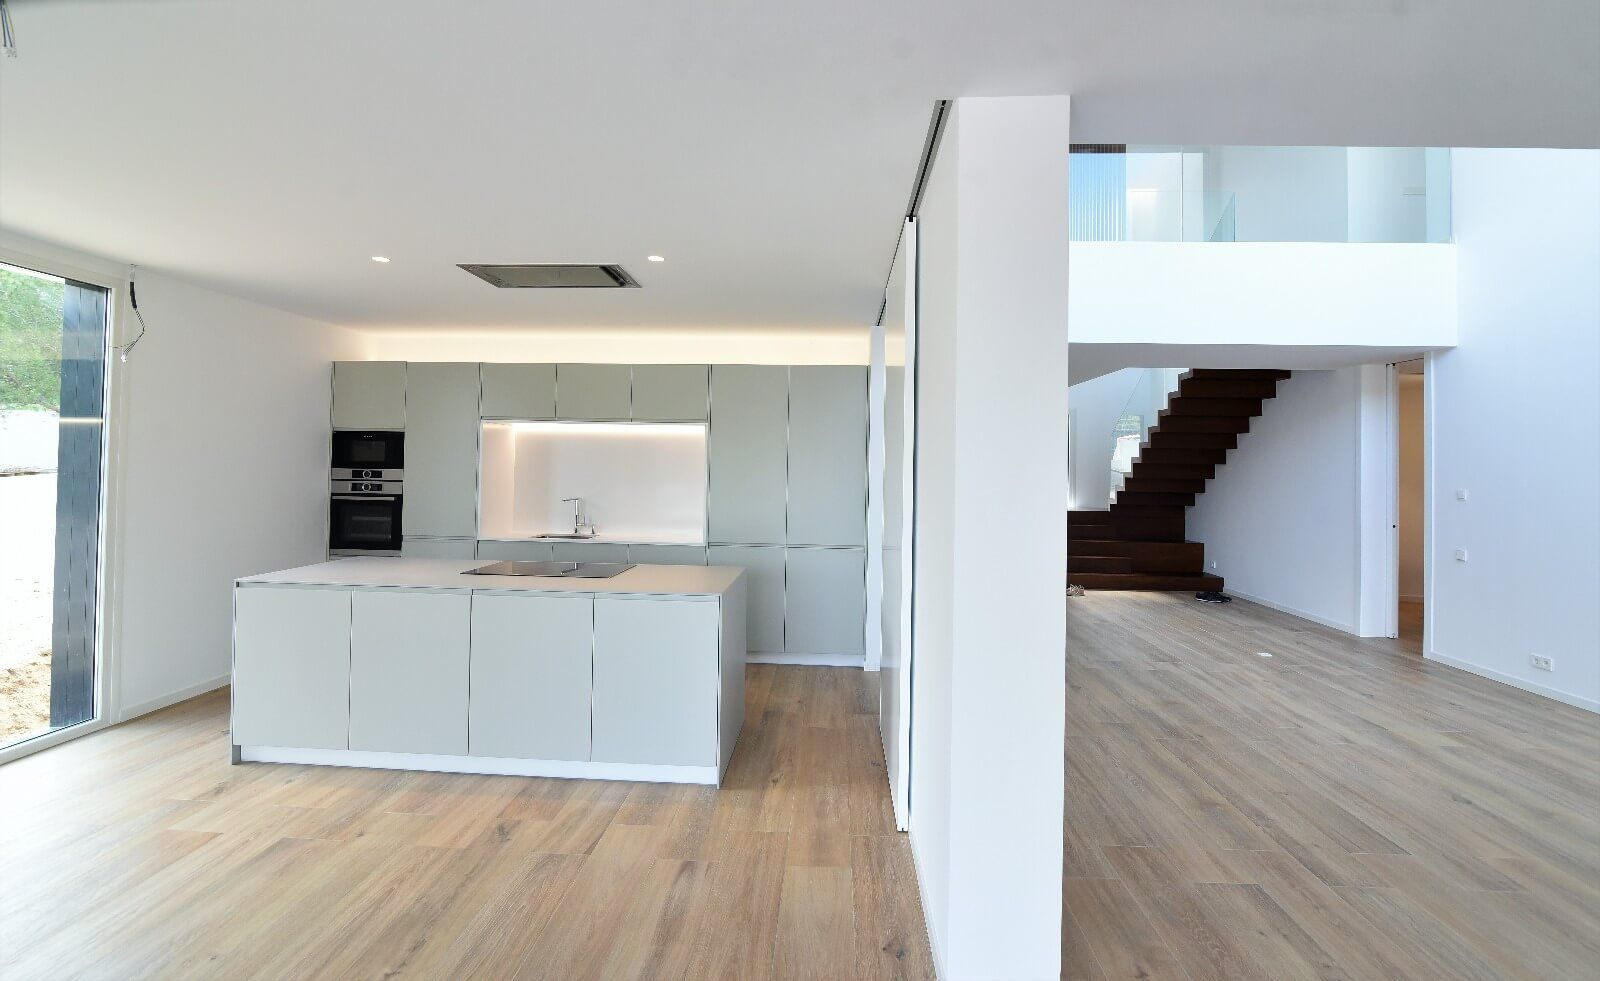 Instalacion domotica e iluminacion interior vivienda